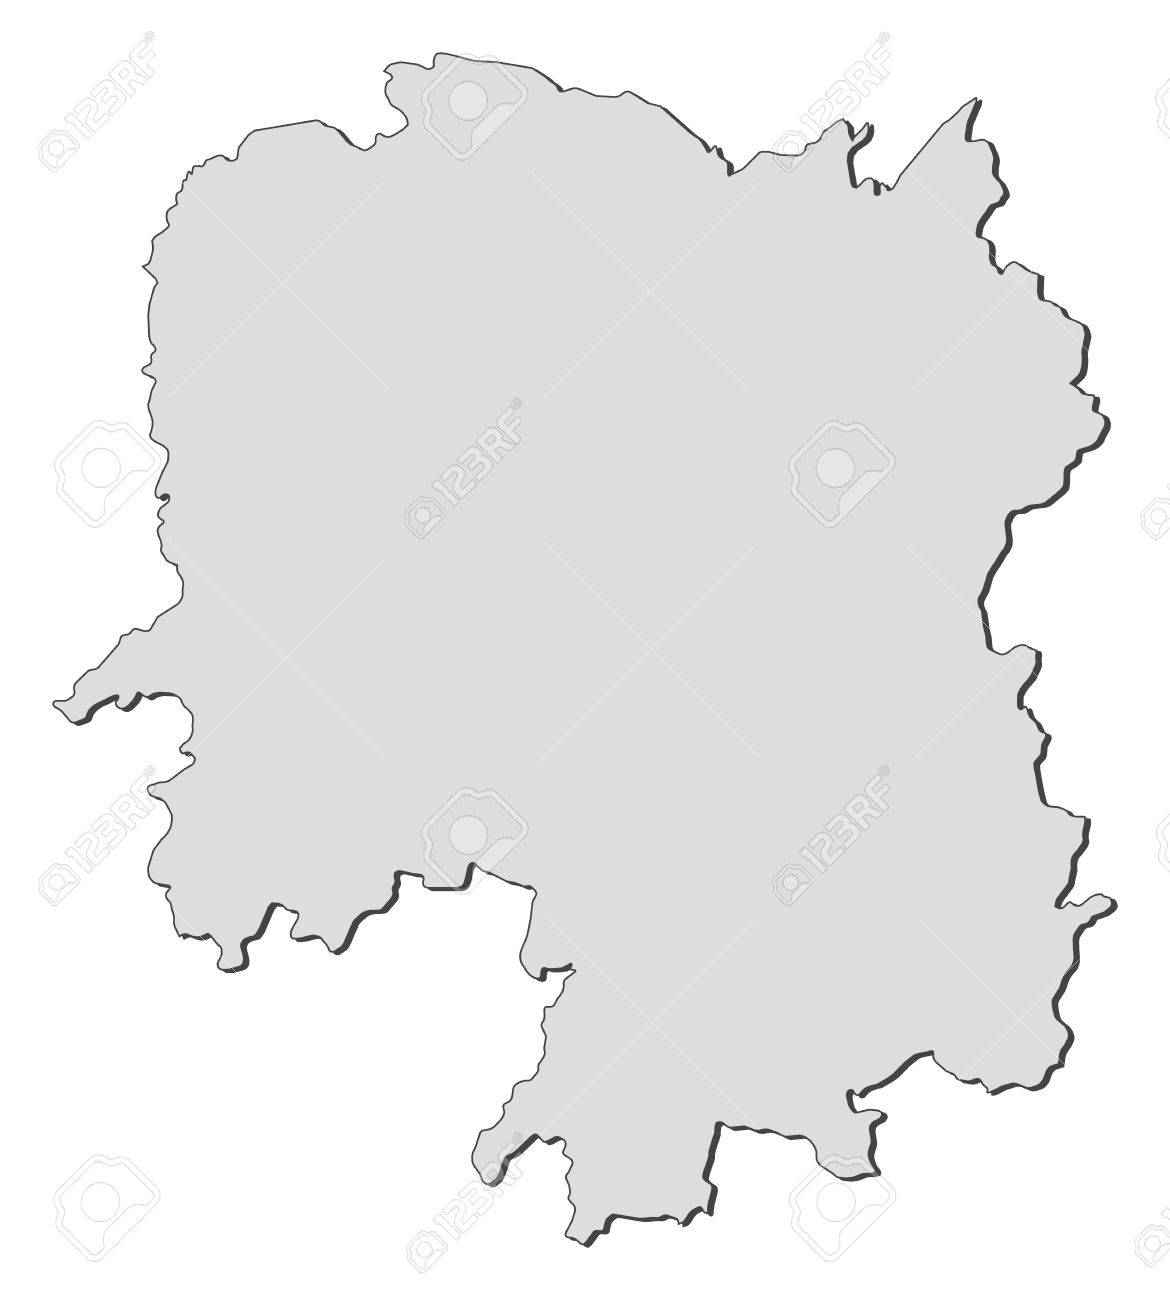 Map of Hunan, a province of China. Stock Vector - 14449994